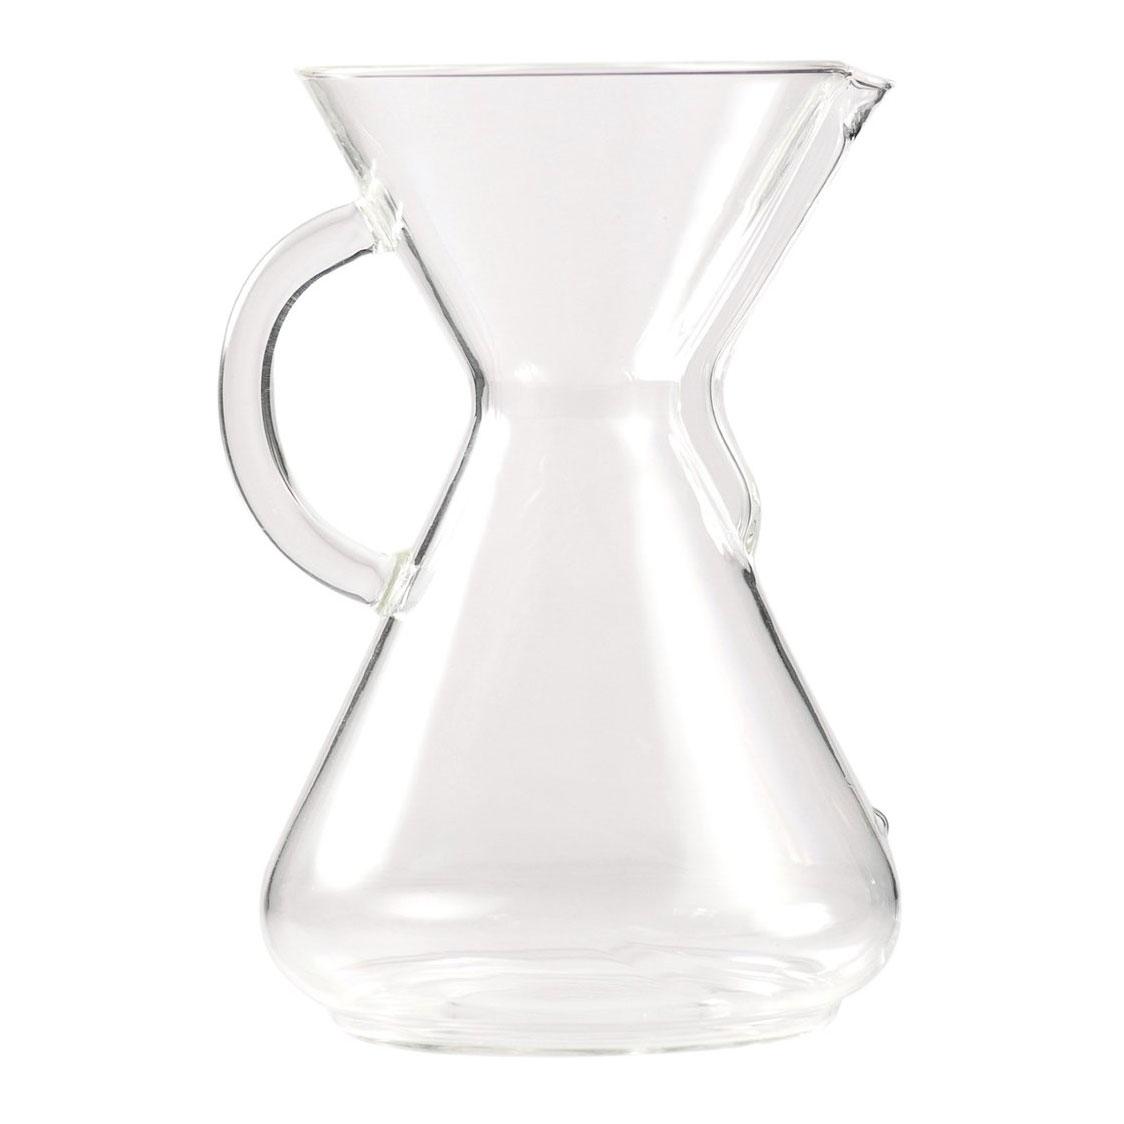 8-cup Chemex